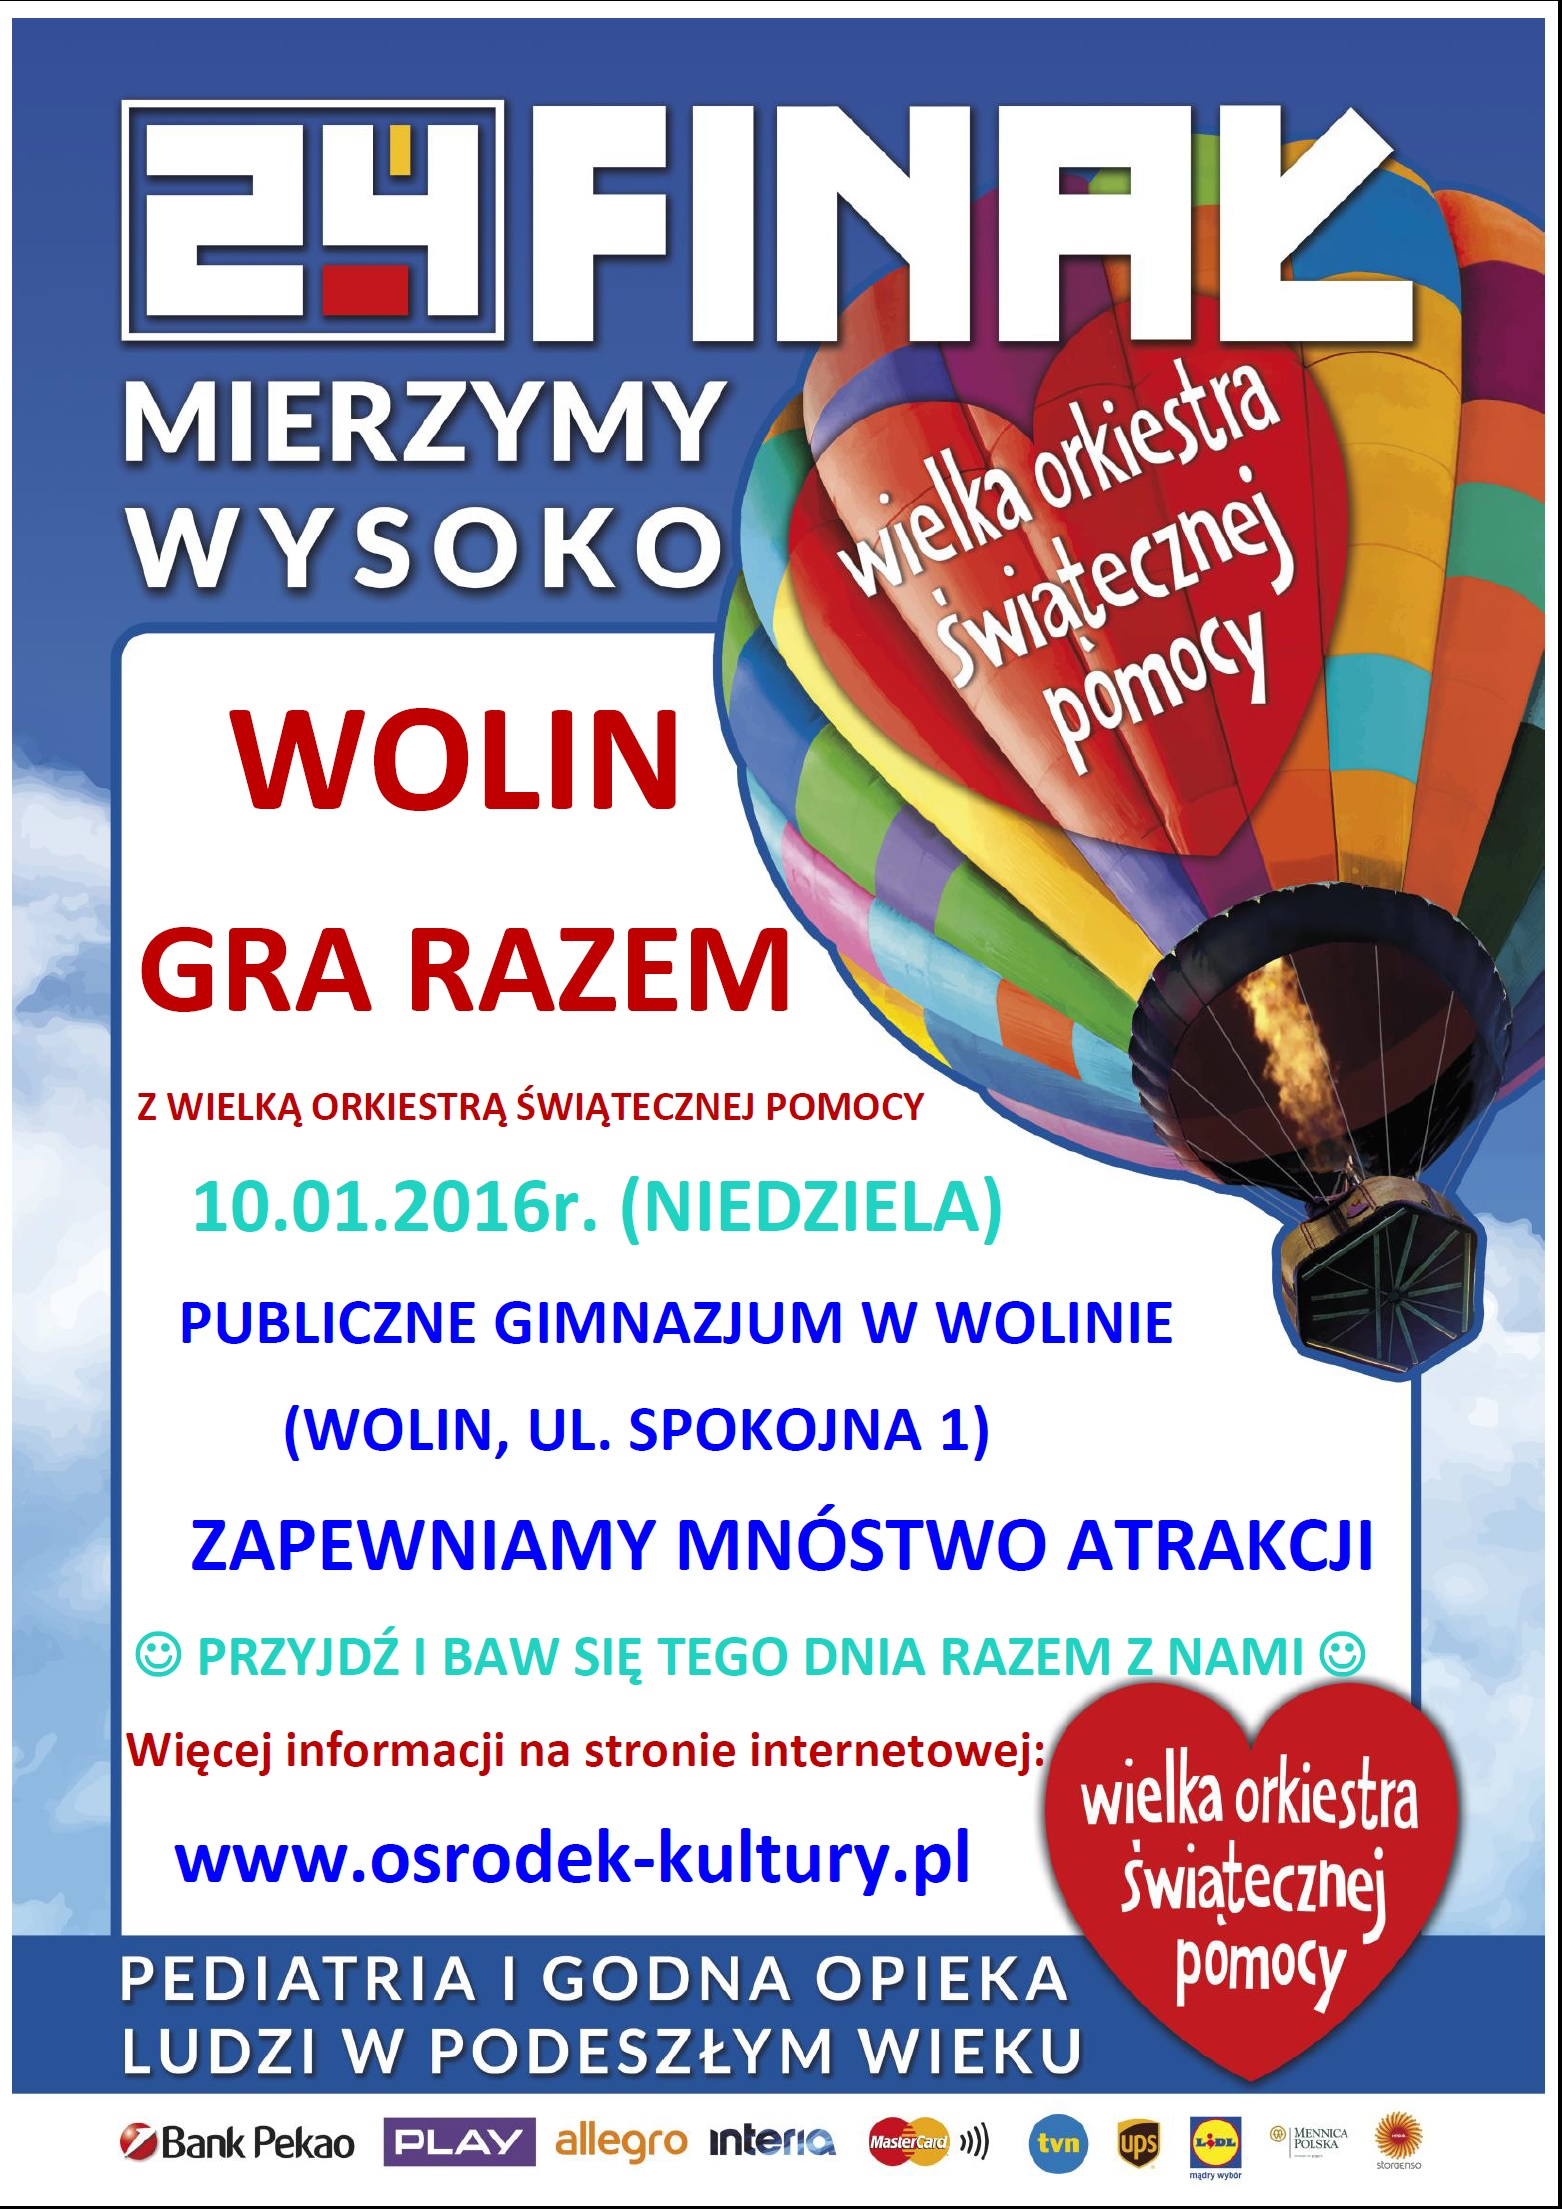 WOŚP Wolin – 10.01.2016r.